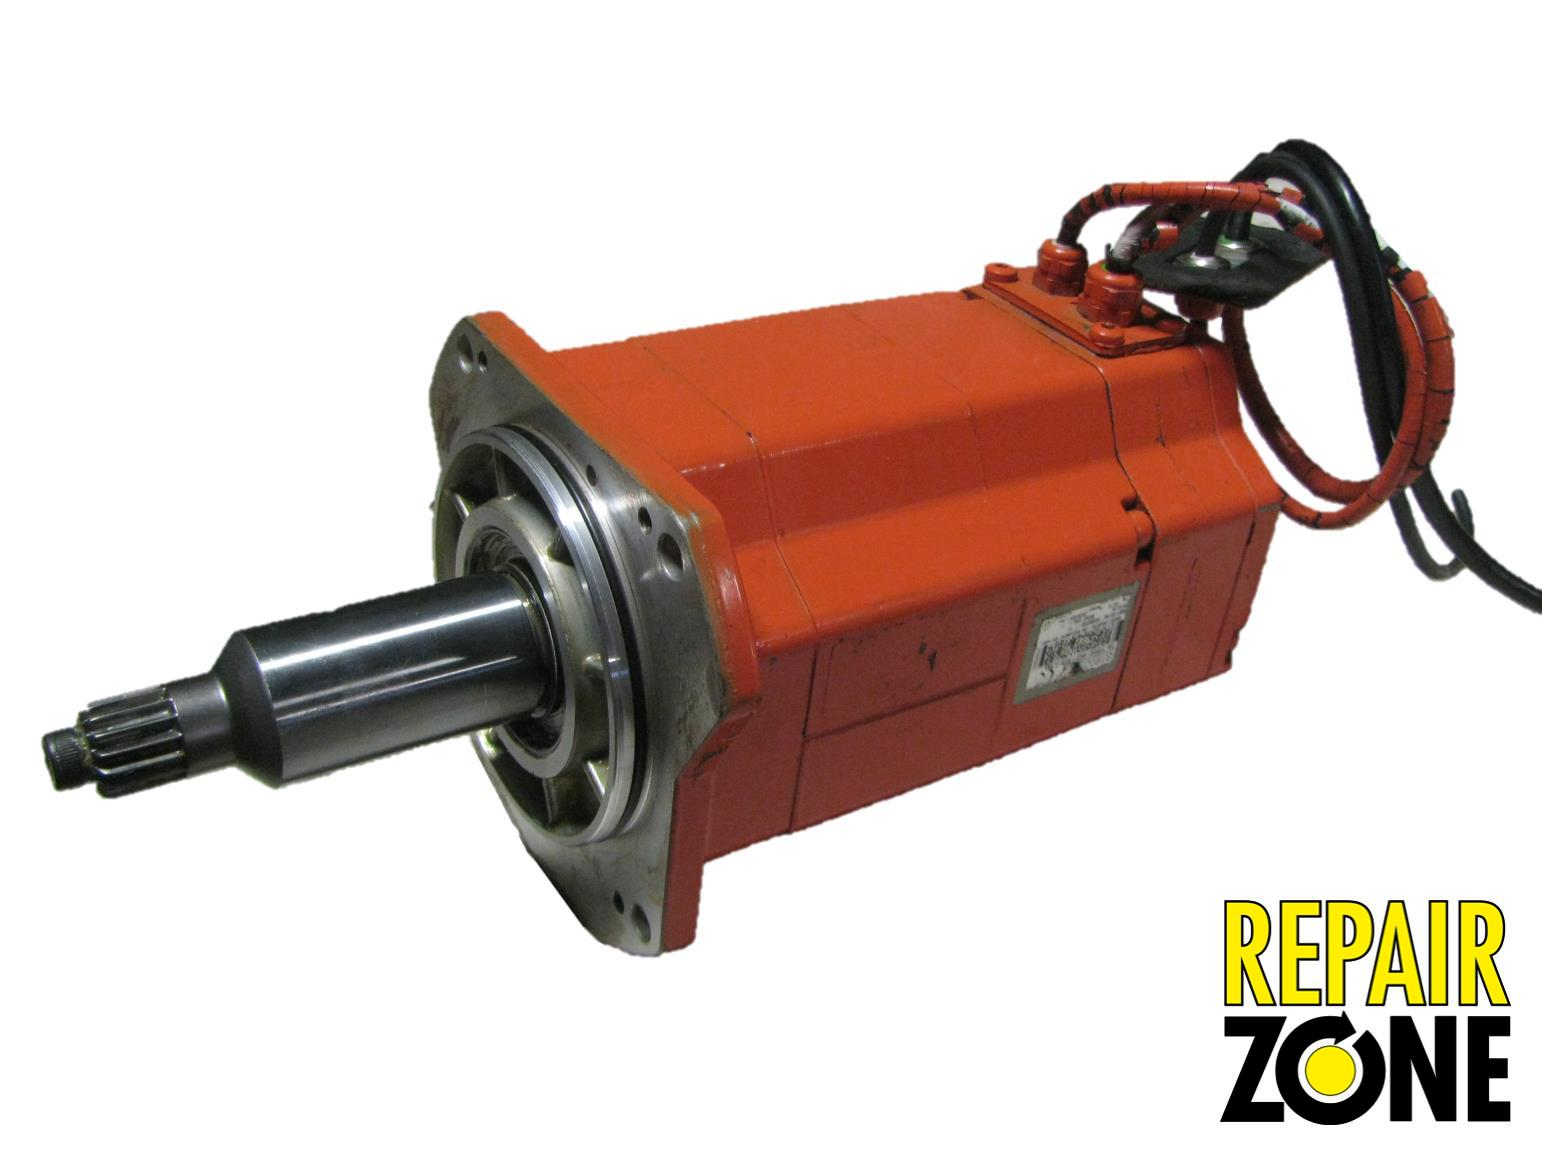 1ft6064 6wf71 4sa0 siemens servo motors remanufactured ebay for Siemens servo motor repair